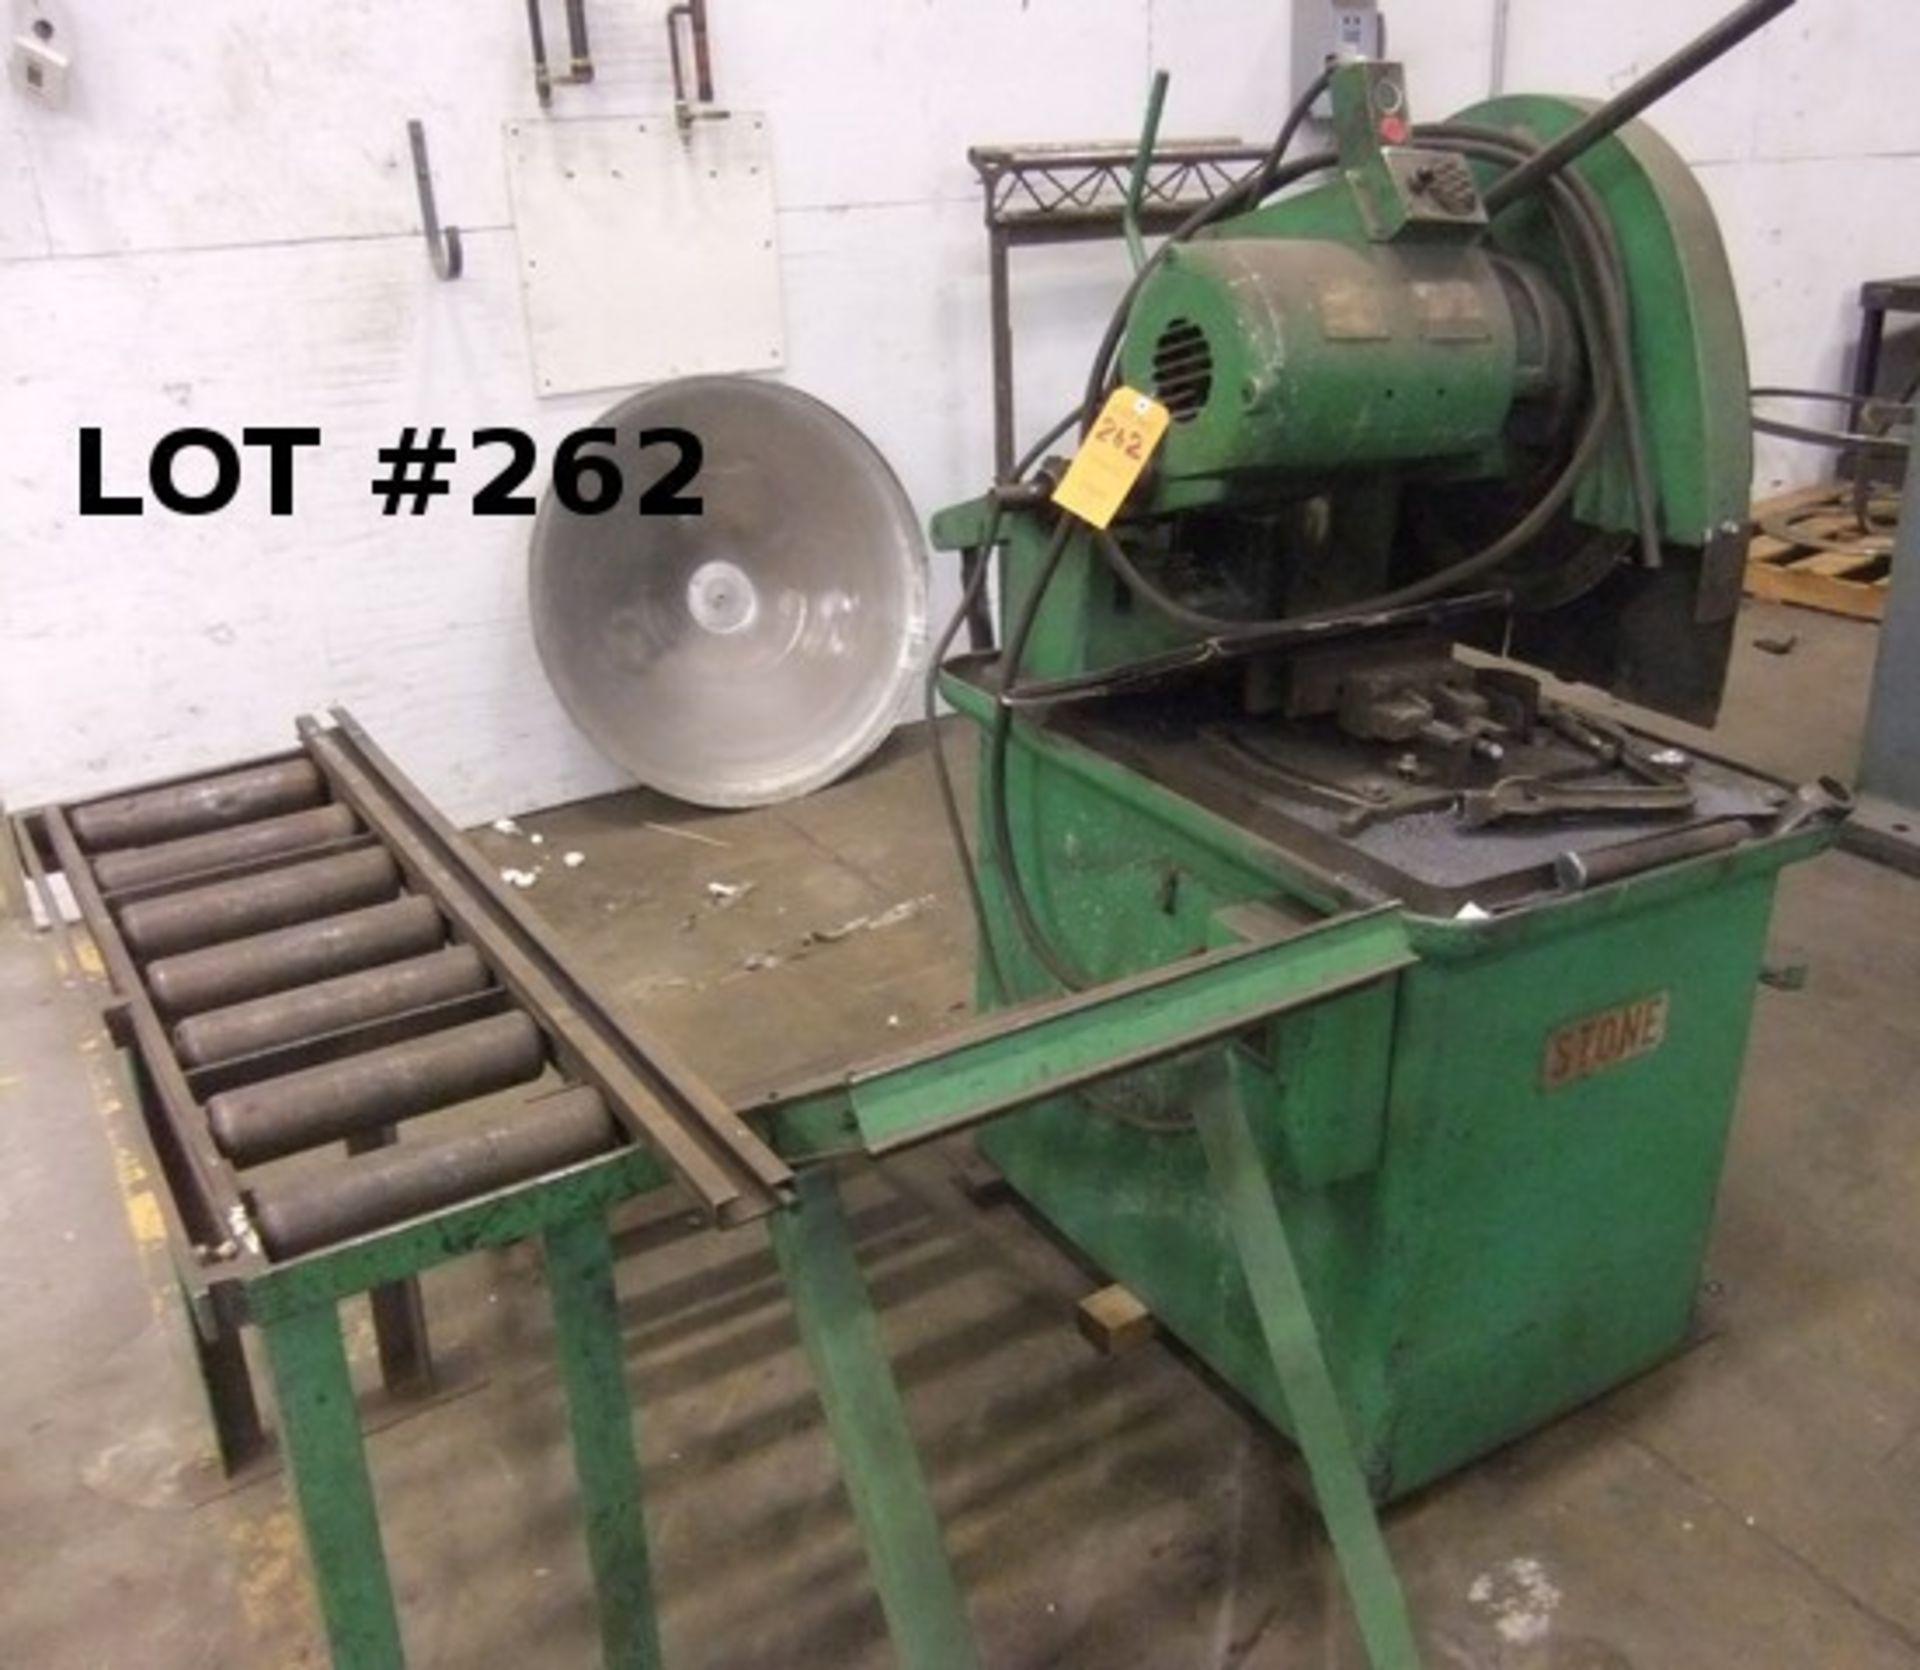 "Lot 262 - STONE MACHINERY 20"" CUT-OFF SAW W/ CONVEYOR, #0183"